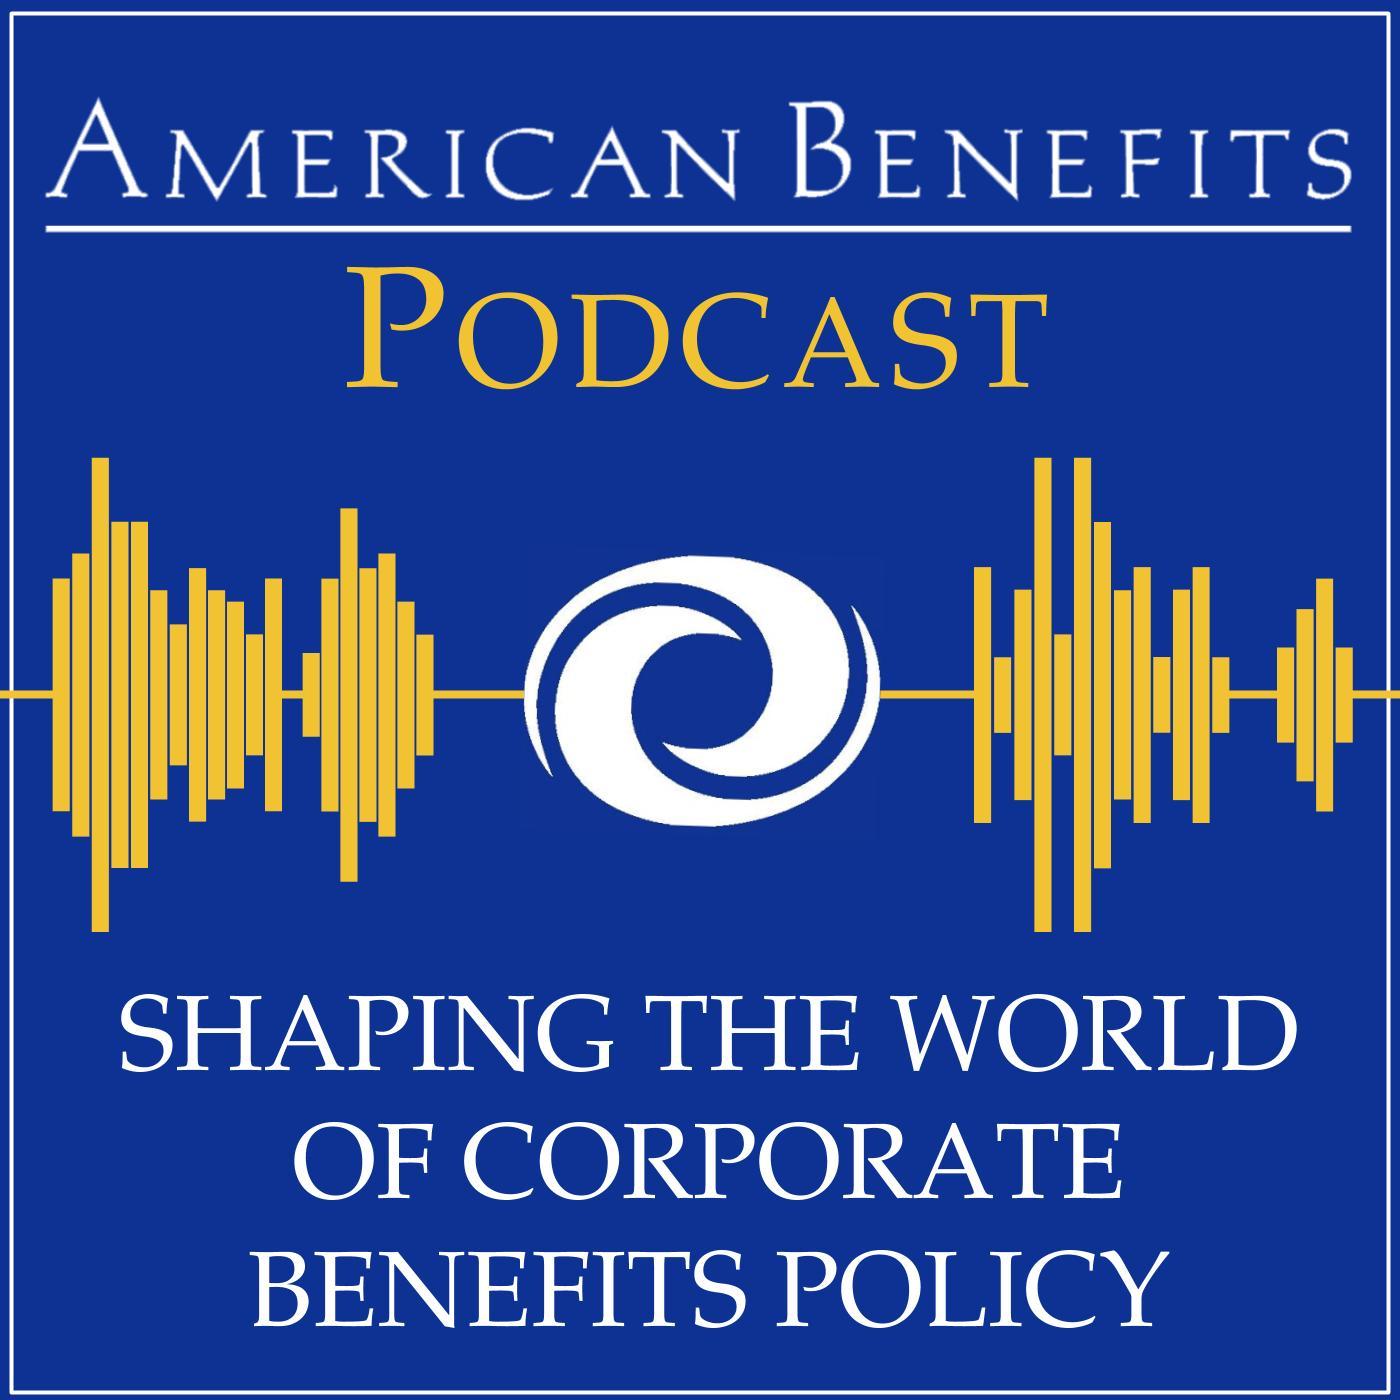 American Benefits Podcast show art